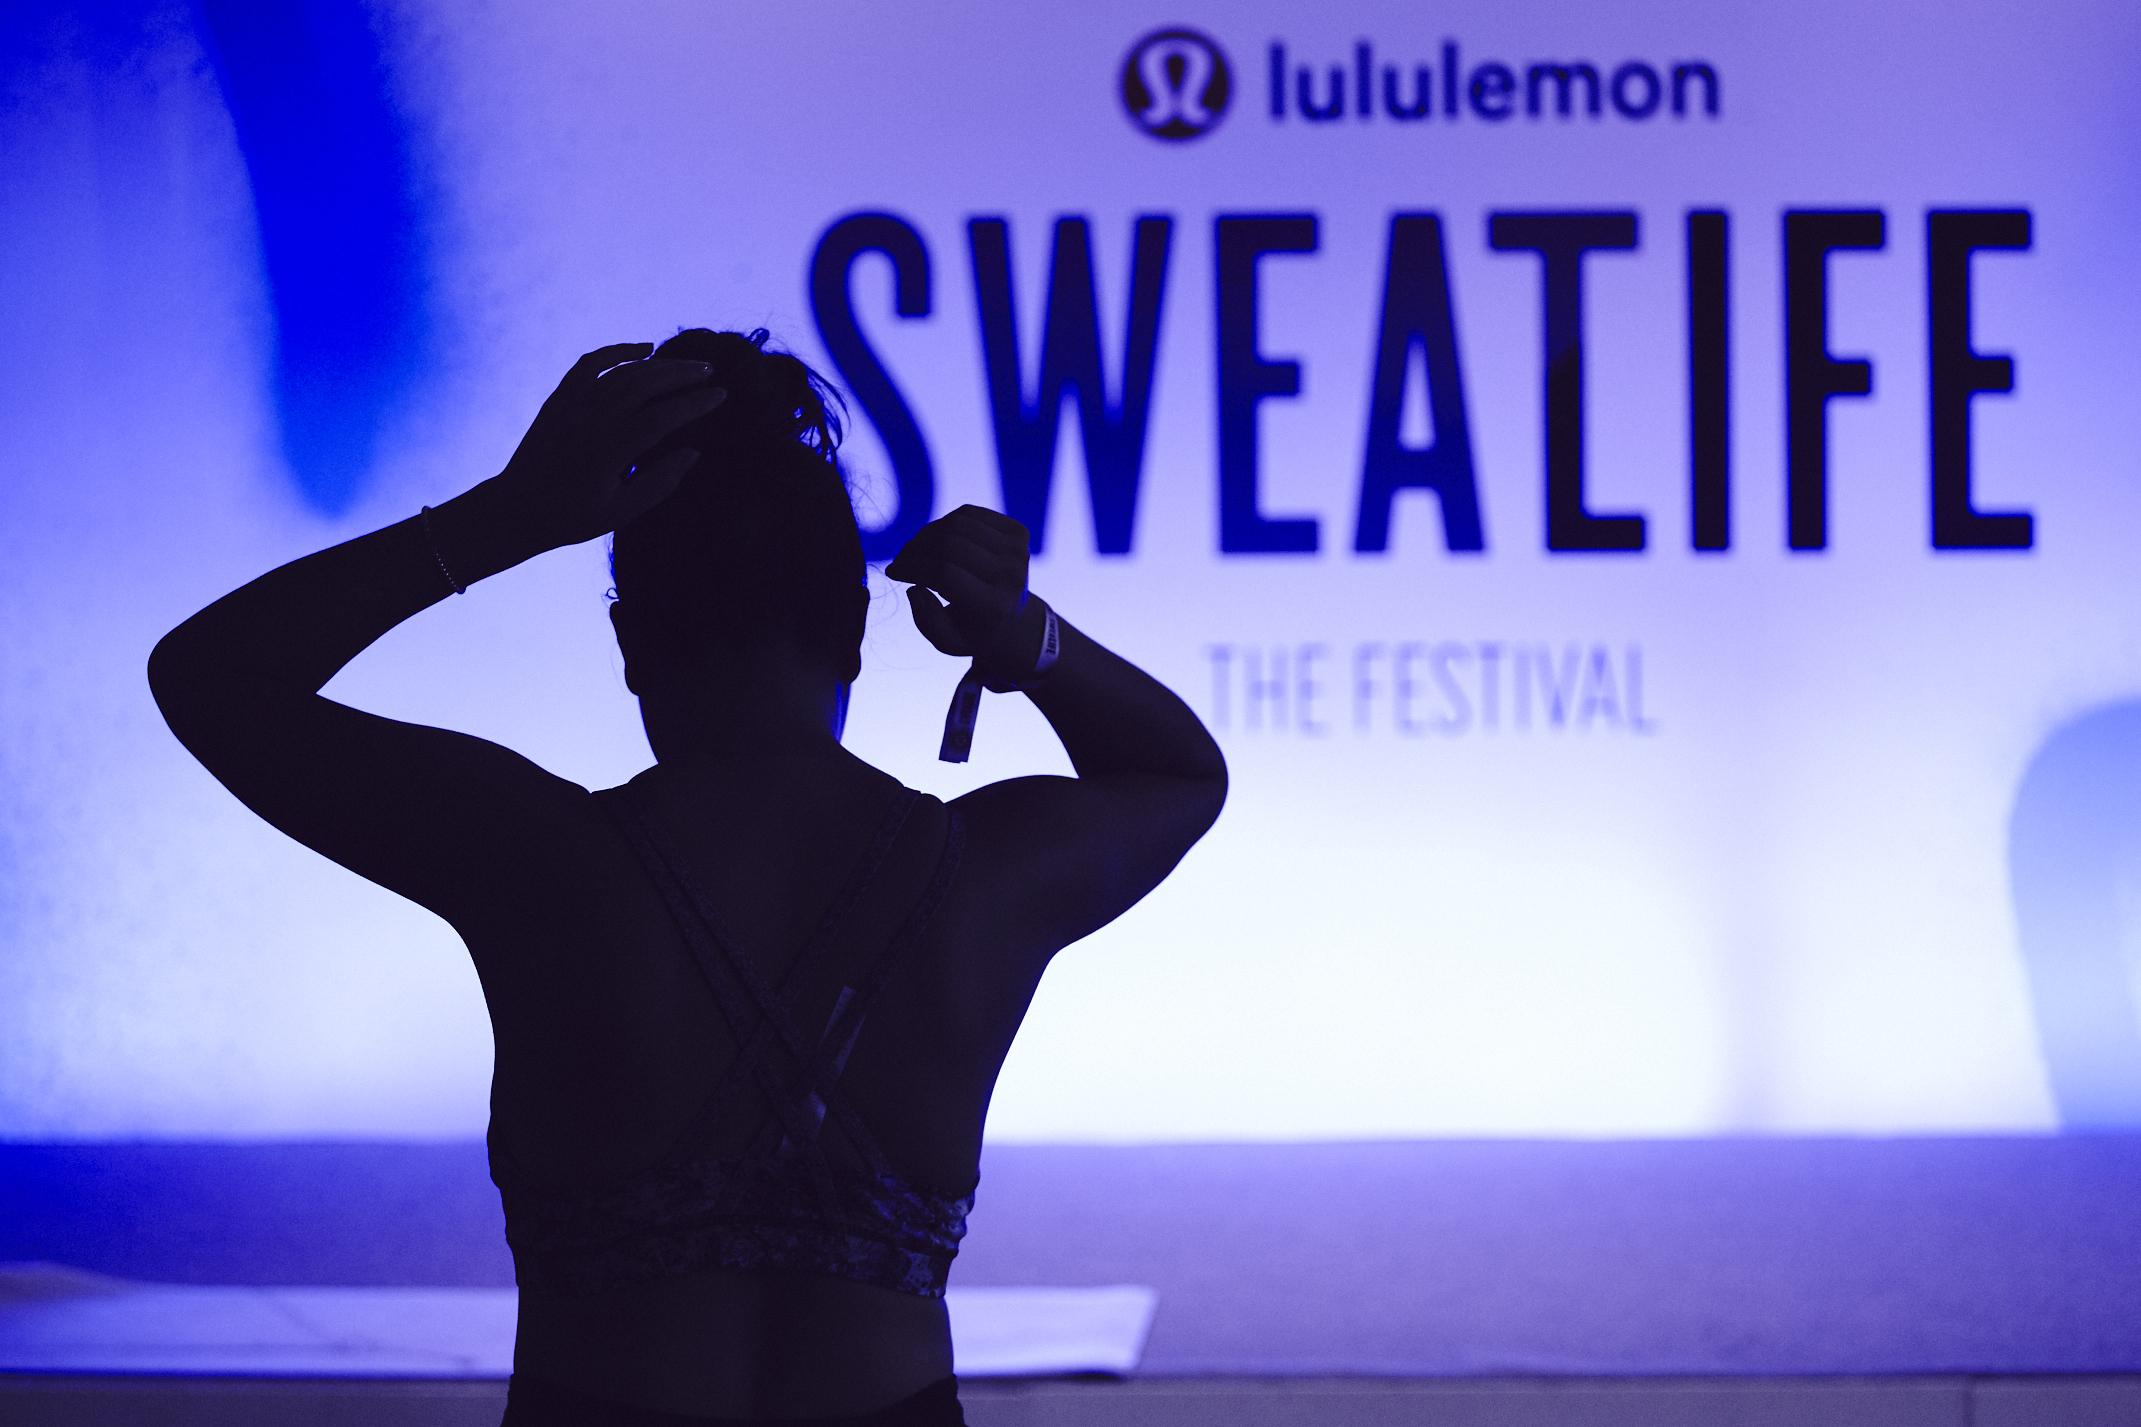 Lululemon's Sweatlife fitness festival